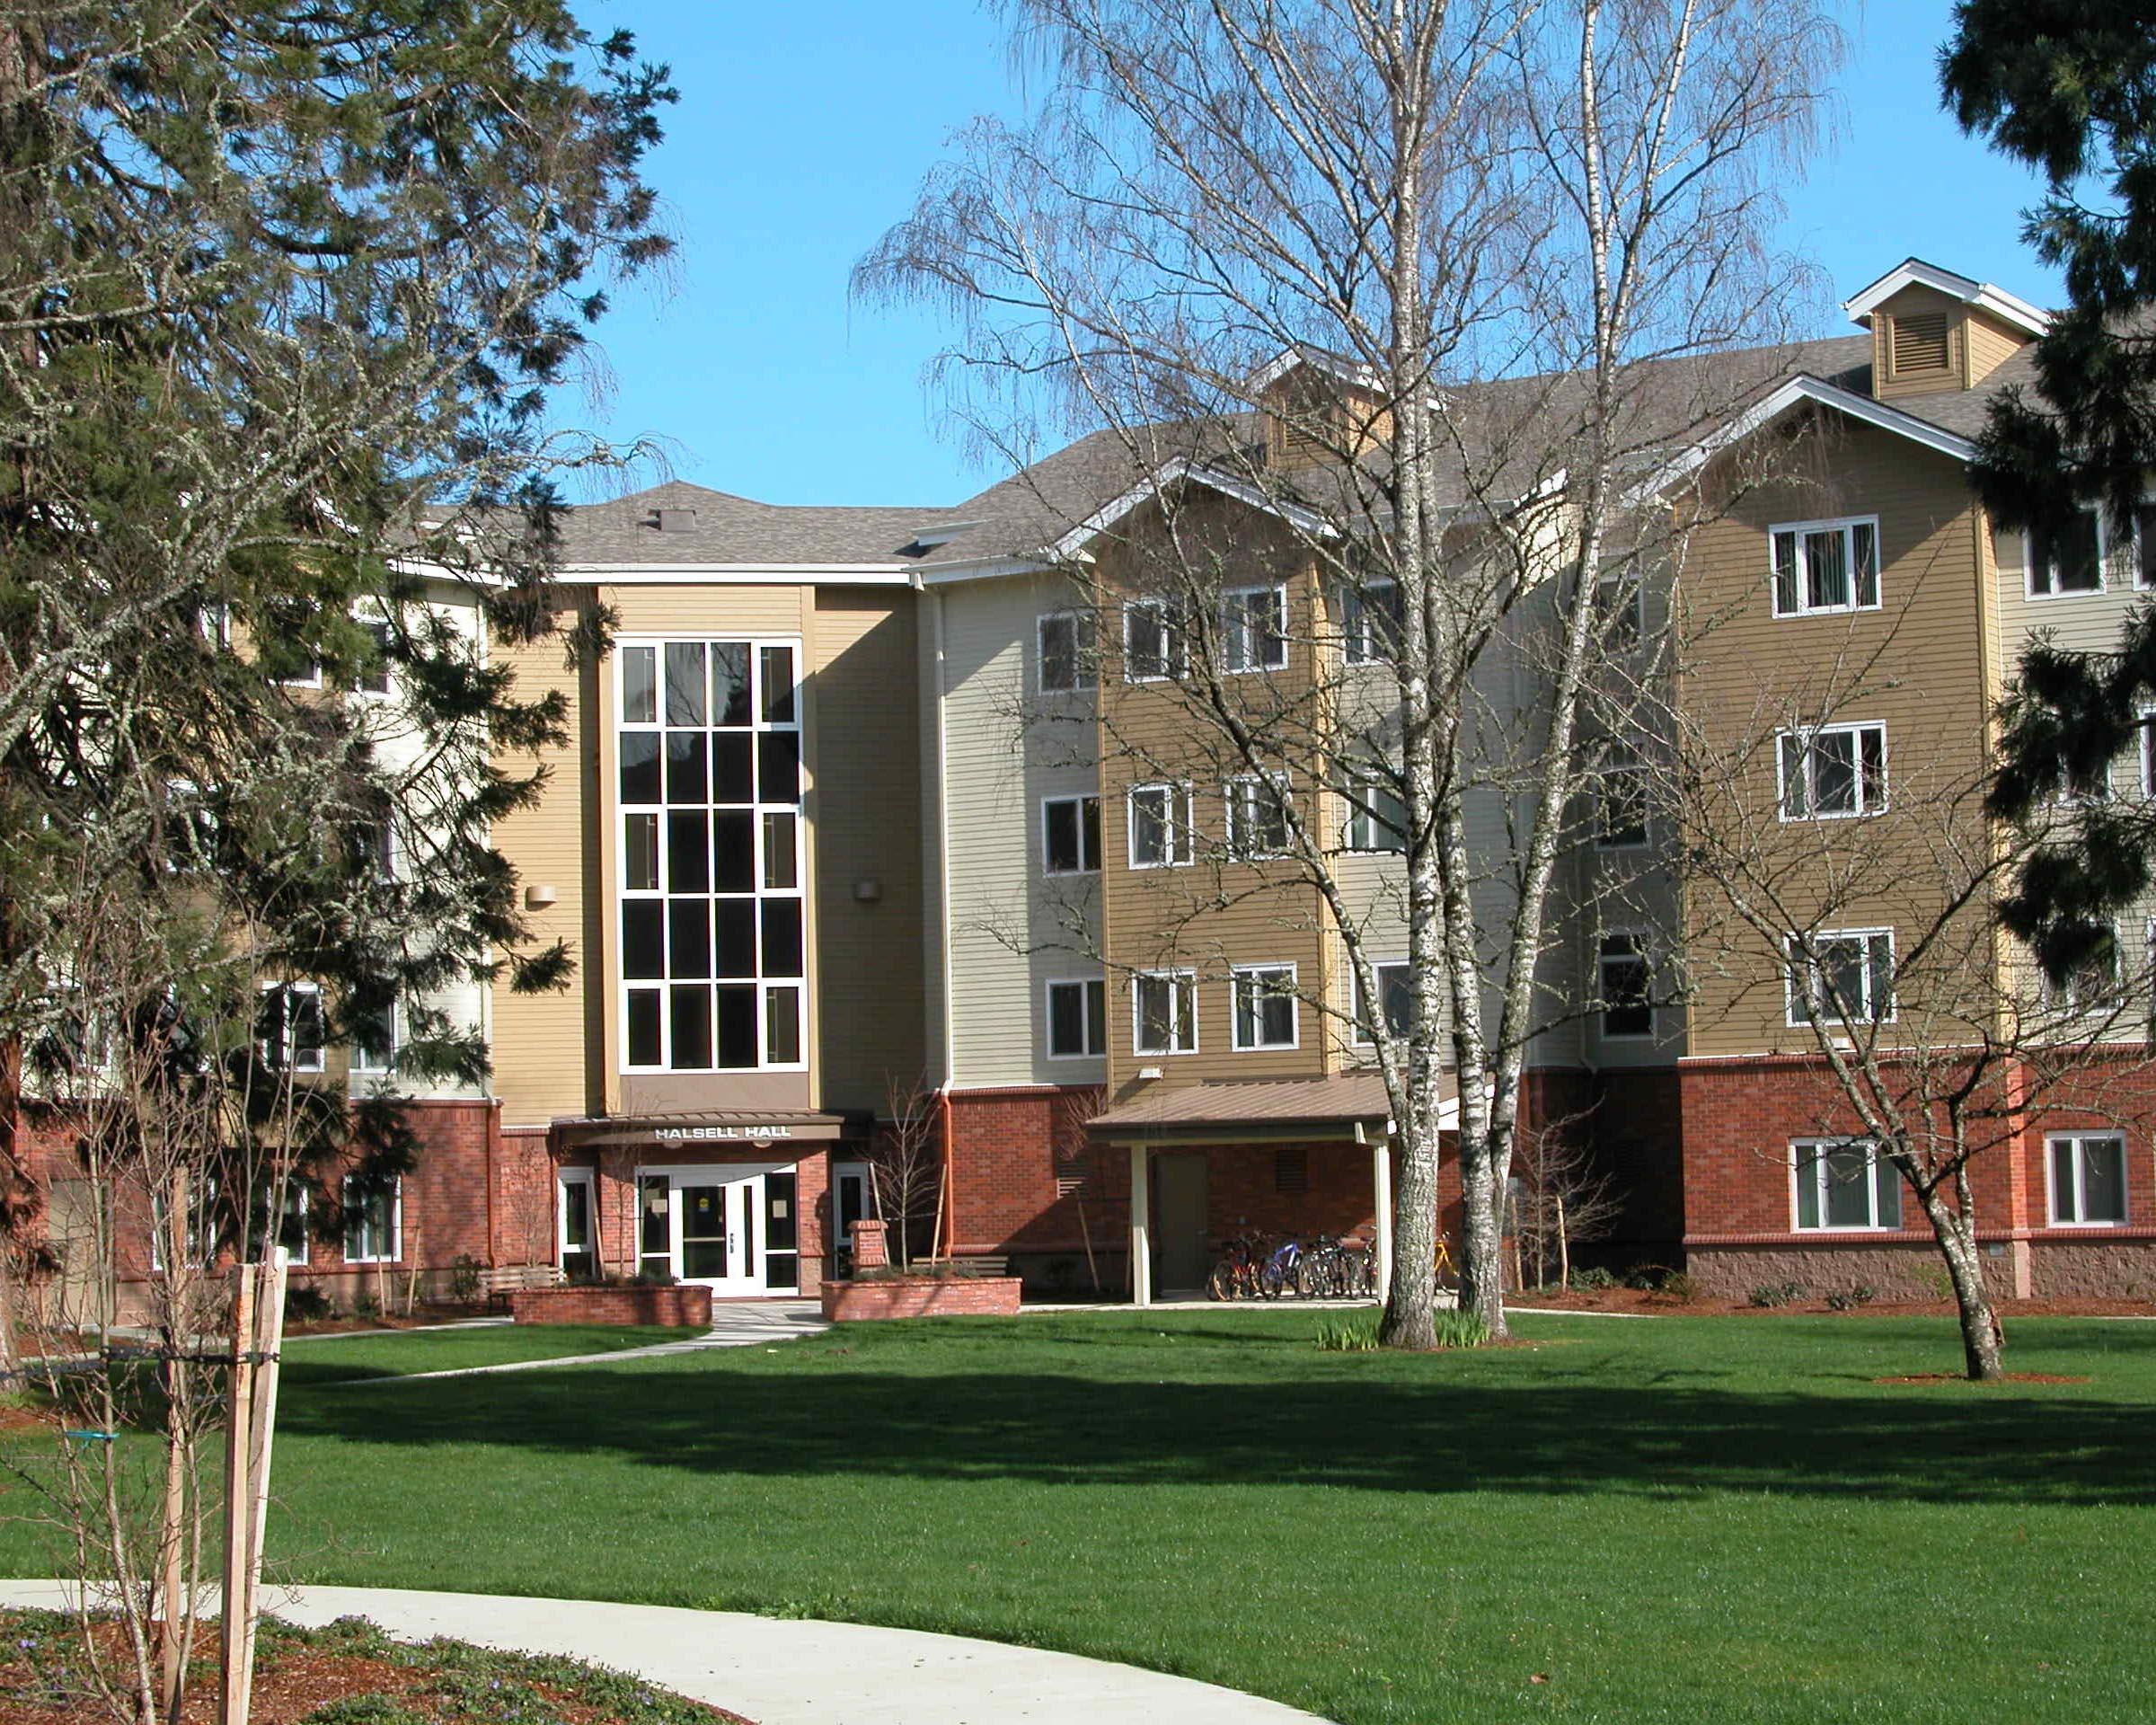 HALSELL RESIDENCE HALL  Oregon State University